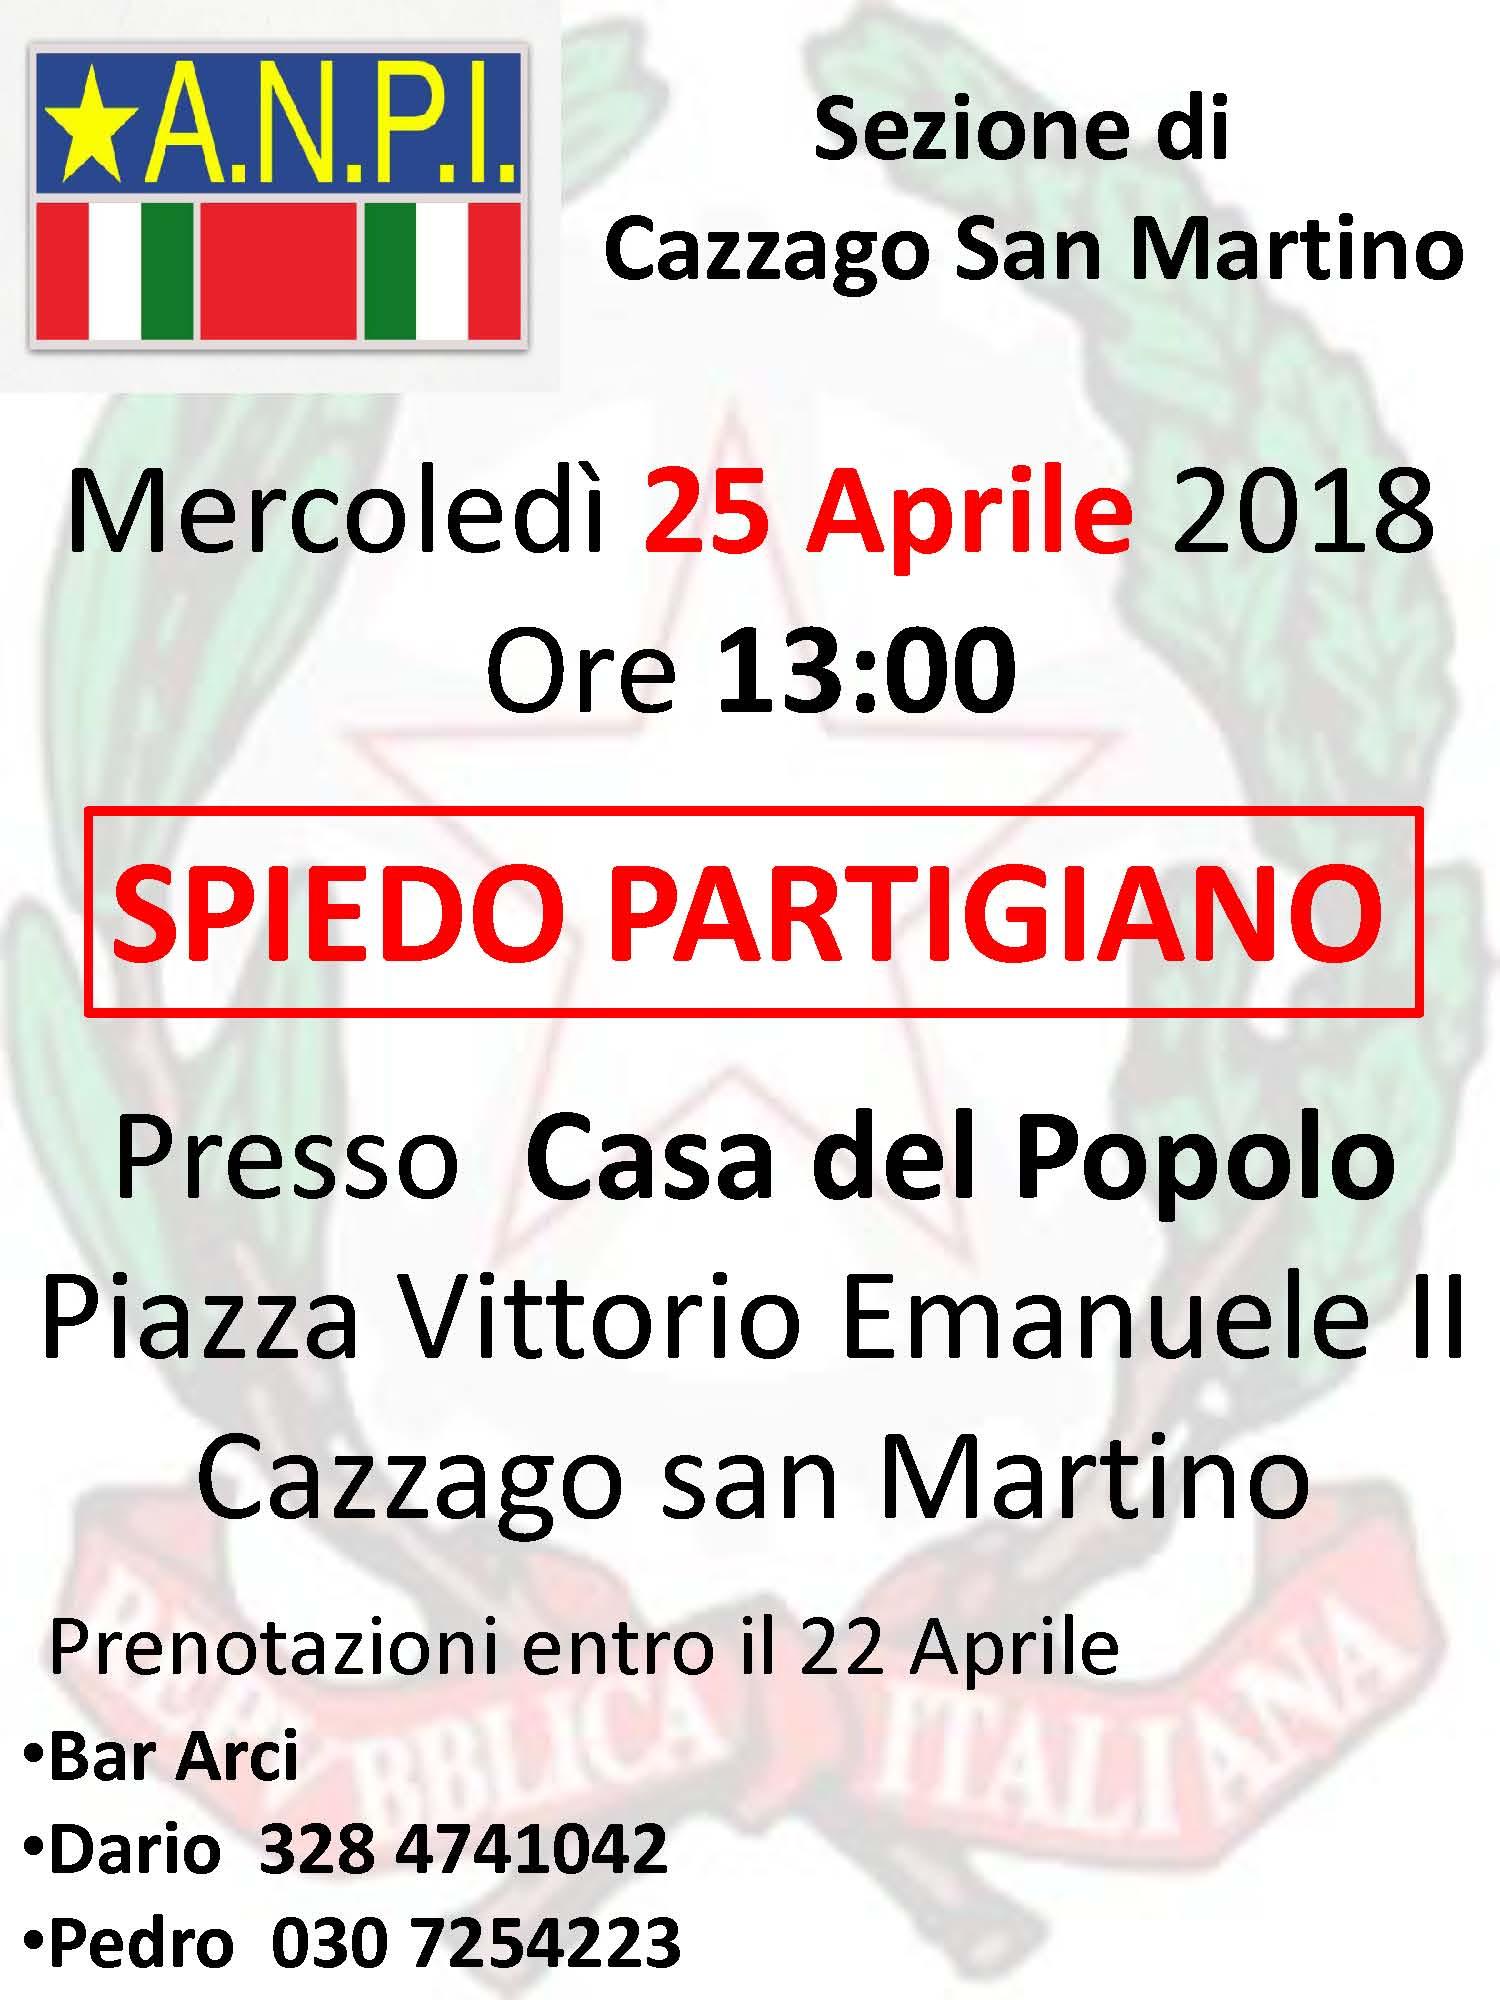 z 2018 04 25 - ANPI Cazzago San Martino